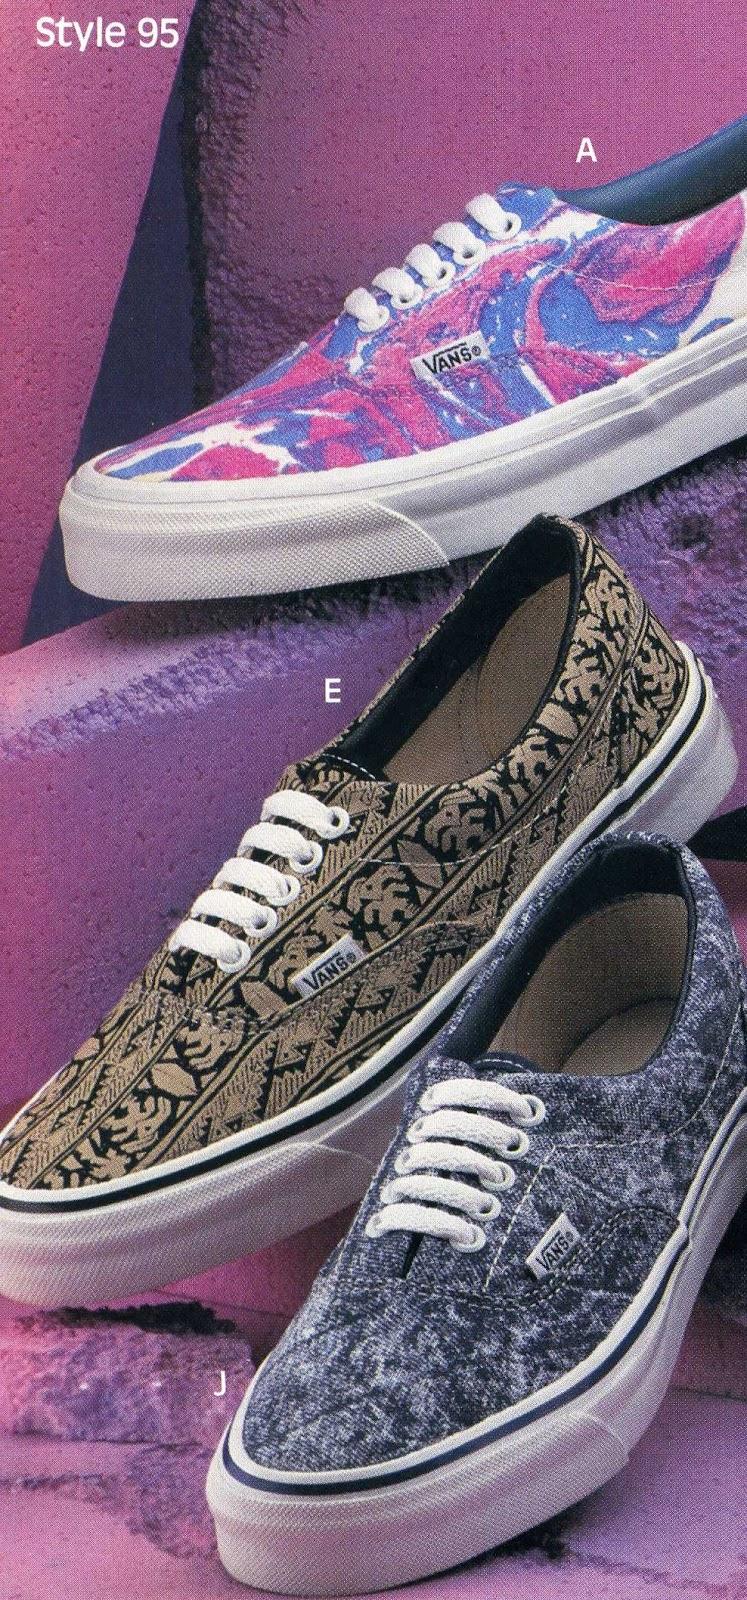 afbc3635fc7bce vintage VANS khaki aztec print style  95 era US10.5 MADE IN USA 1990 s